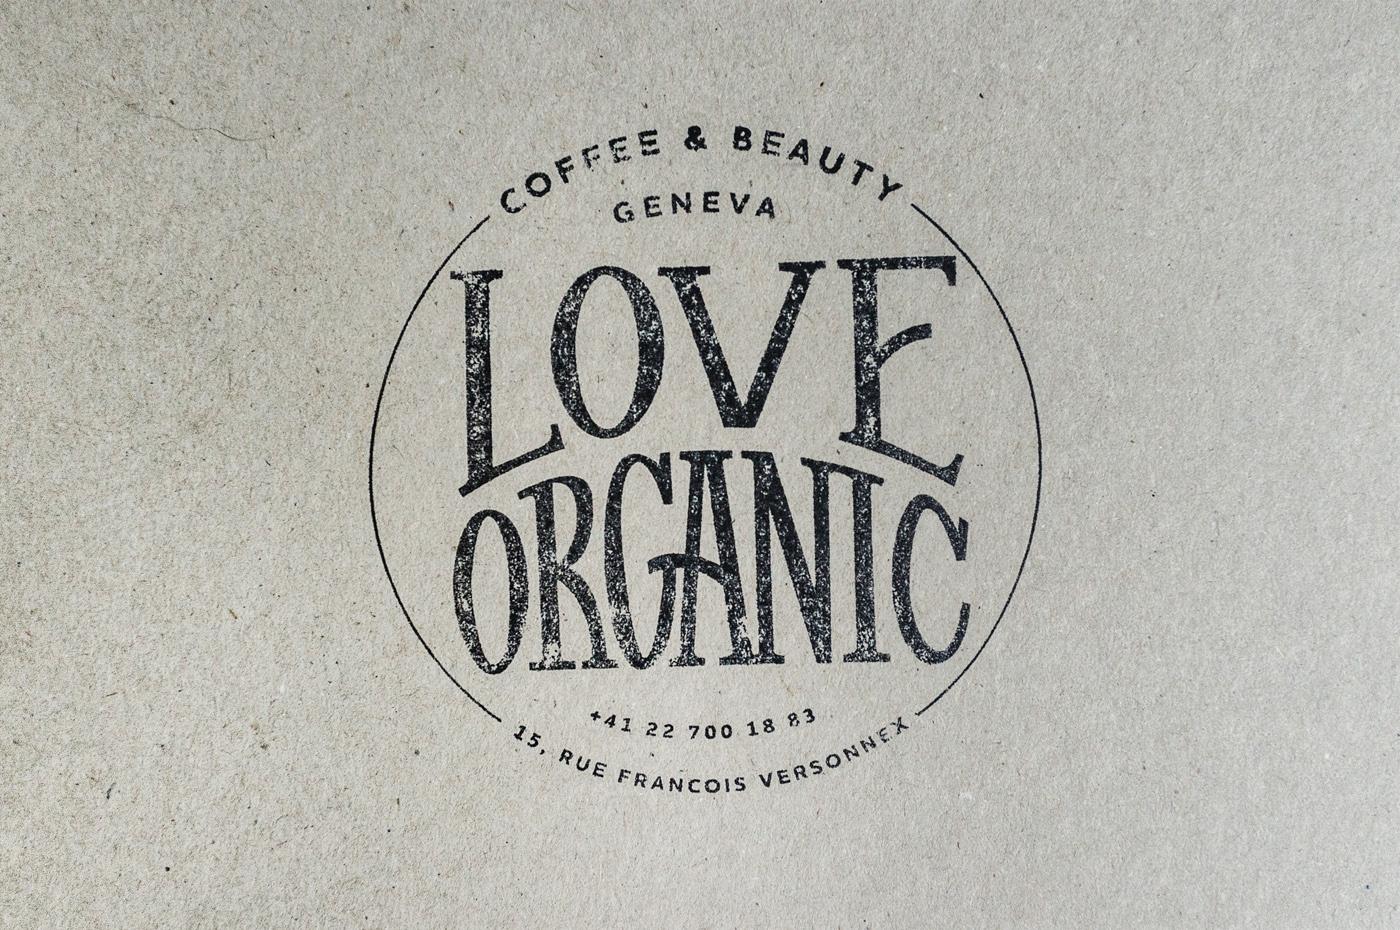 Chalk art,Hand Lettered,lettering,logo,Switzerland,Geneva,coffeeshop design